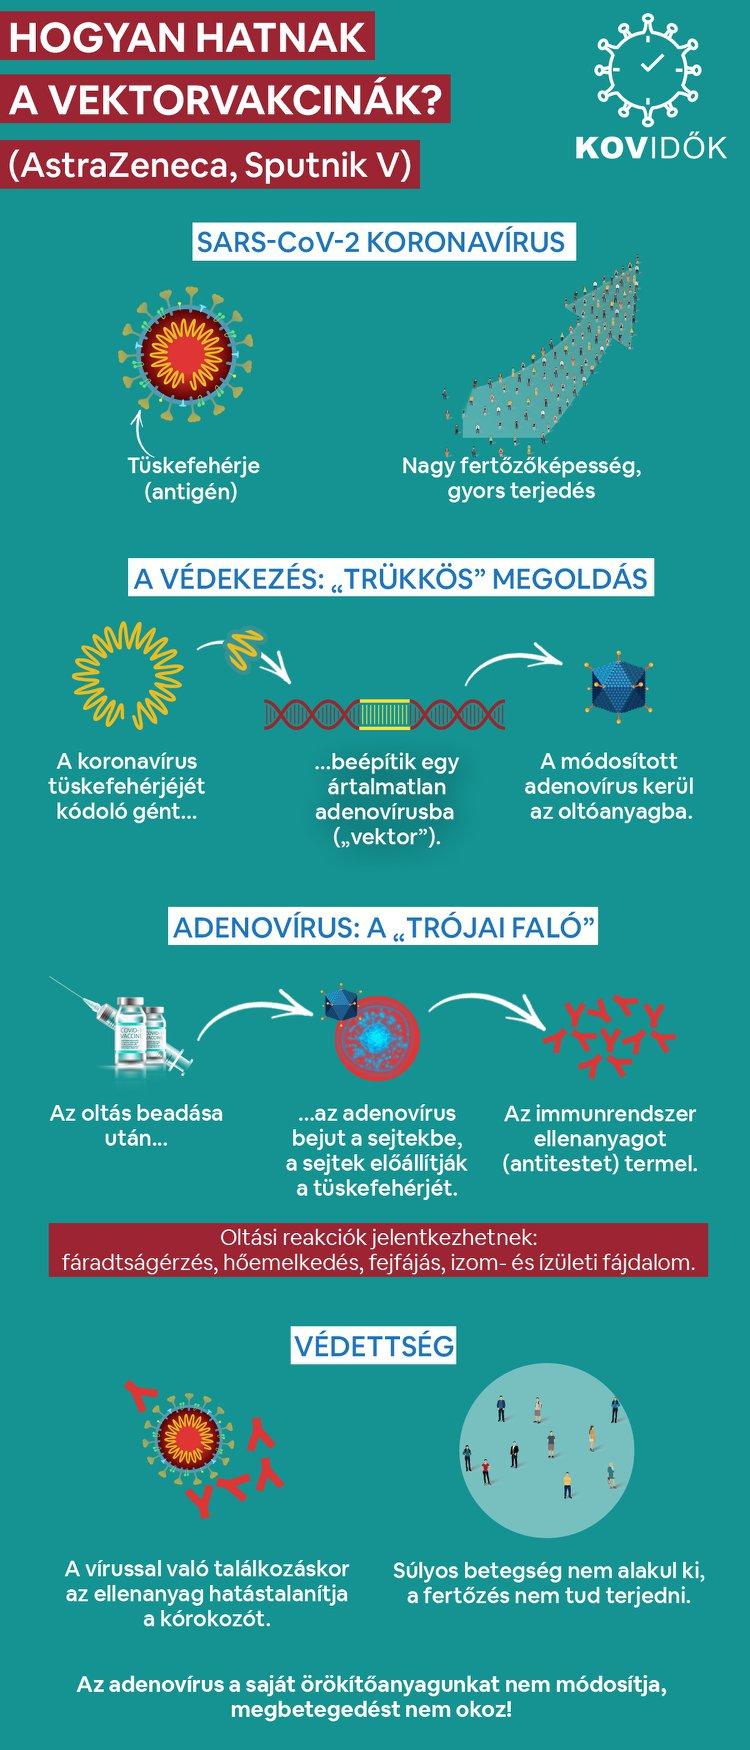 Vektorvakcinák